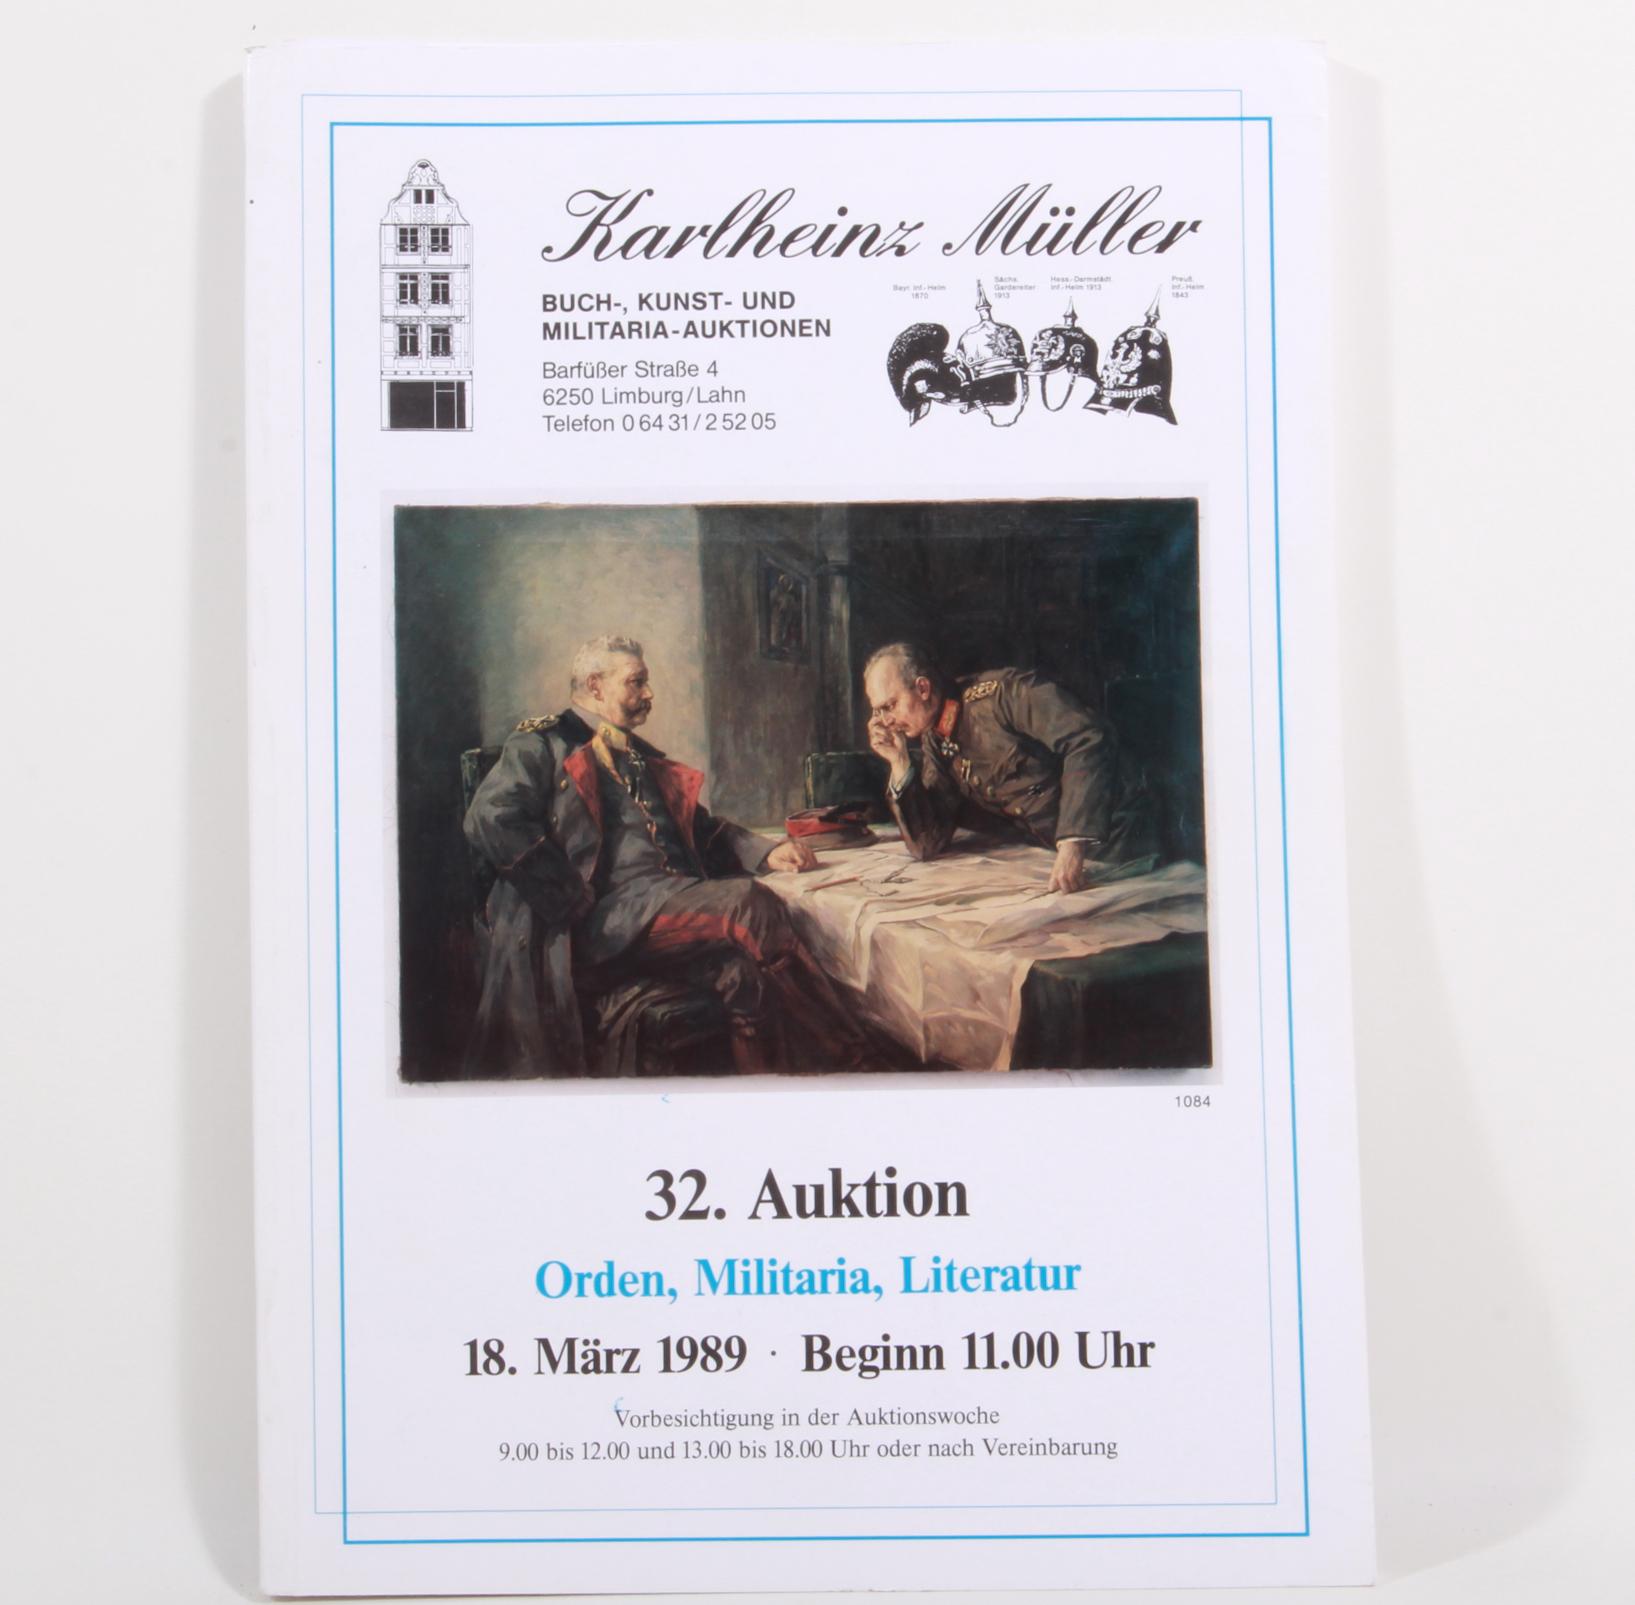 Auktionskatalog Karlheinz Müller 32.Auktion